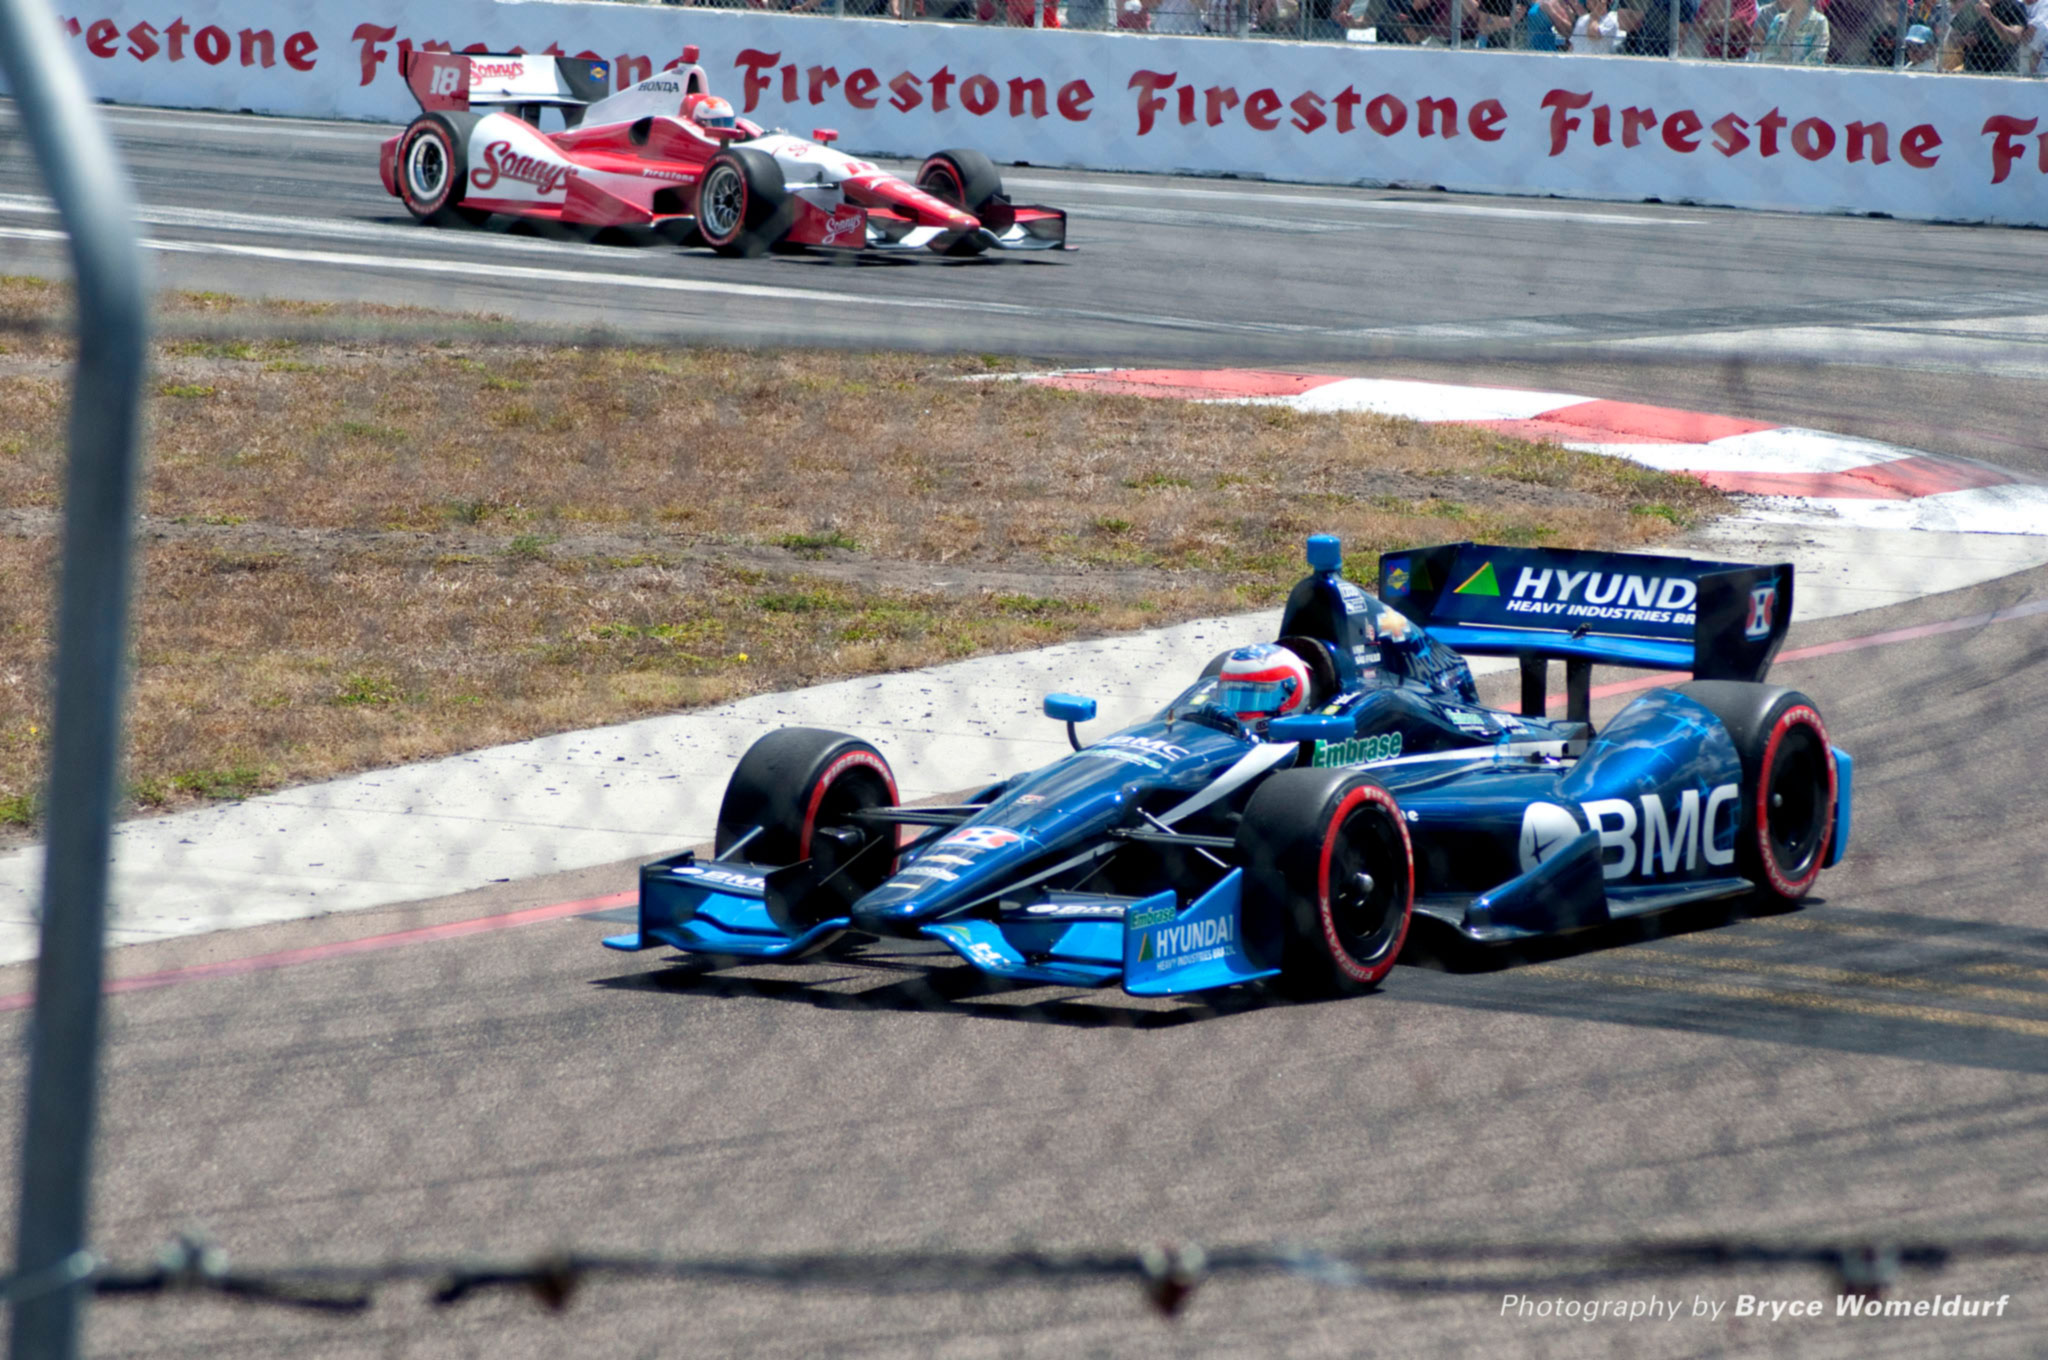 F1 Rubens Barrichello em 2012 - Indy - foto by Flickr Bryce Womeldurf